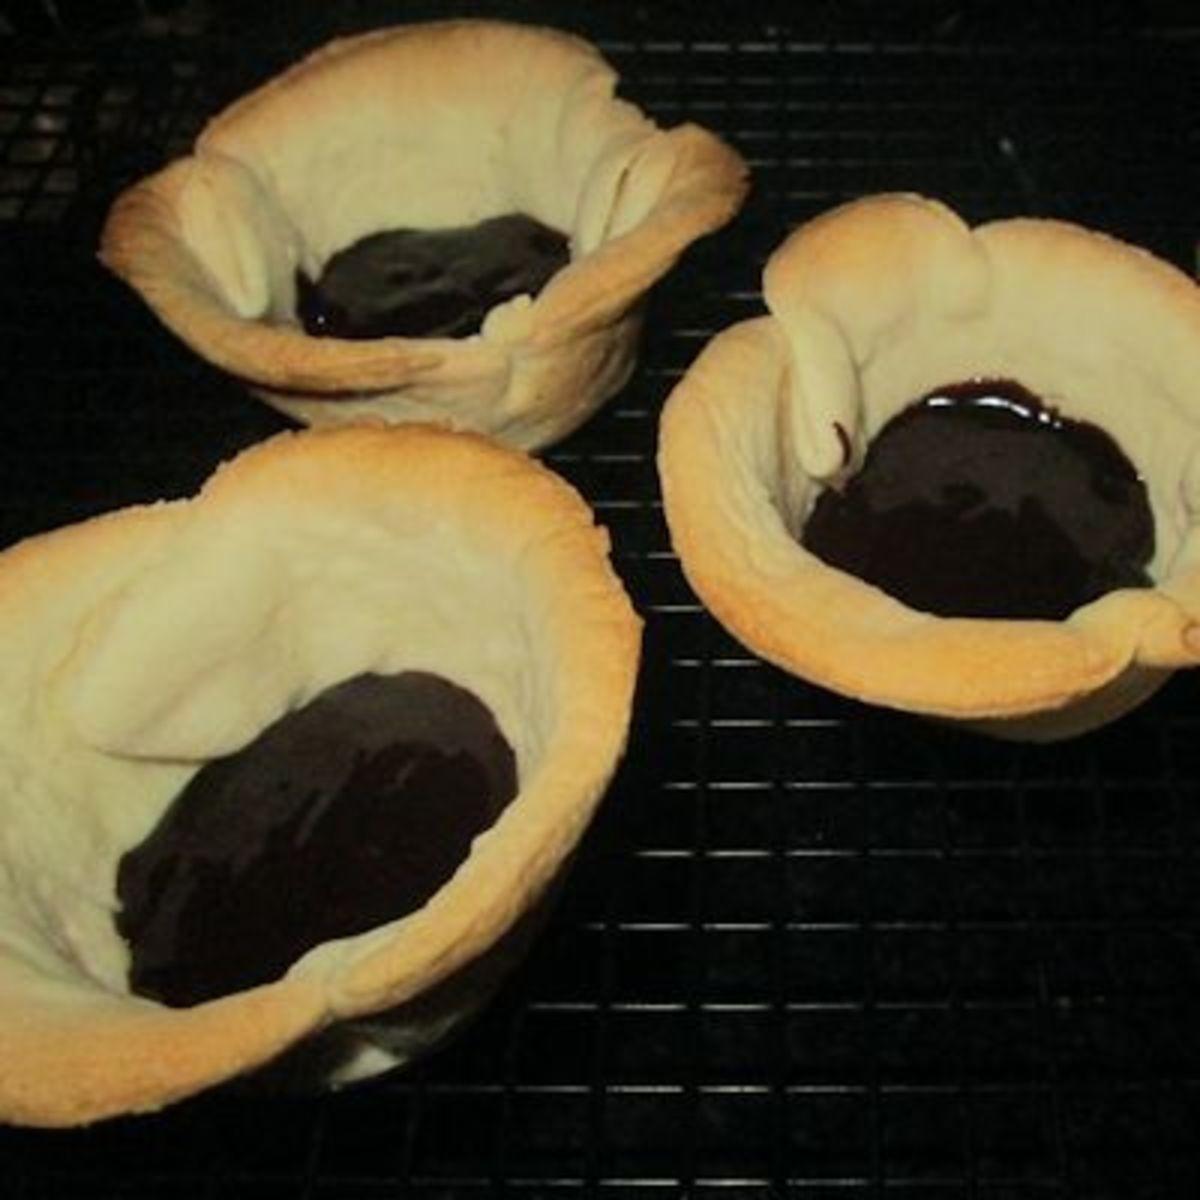 Layered in bottom of tart shells